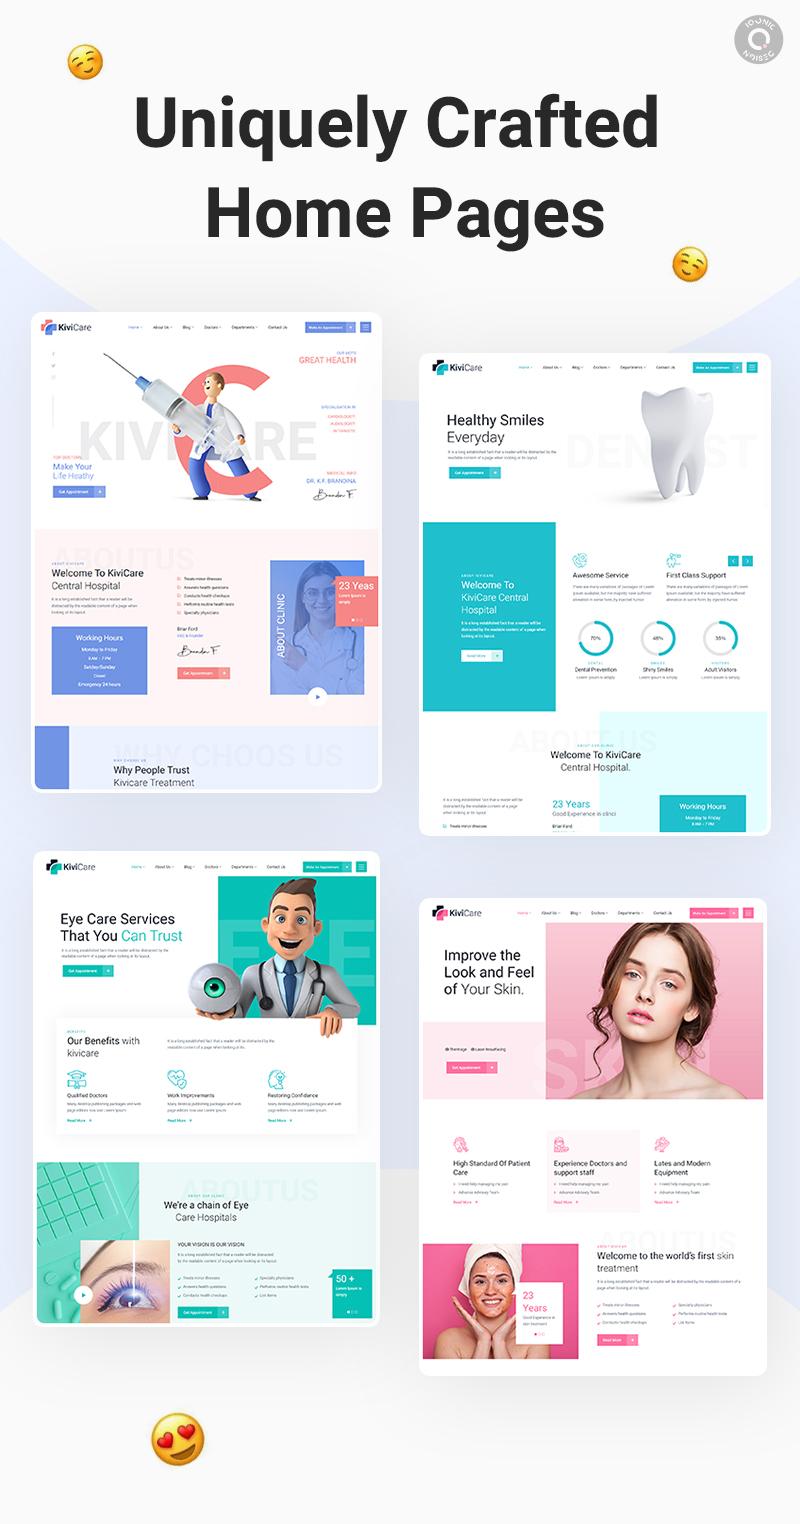 Medical Clinic and Patient Management WordPress Theme | KiviCare | Iqonic Design  Latest Flutter UI Kit For You To Build A Mobile App – KiviCare EcoSystem 0i5qtZRp6u6EAeucV03HZR1aj0 UahZWacWq90bNyXD9JEK3pi7WD3FGjNcGYCJKynmeBPYyNQVyI ZIsqWtD8O9APQCmg7IcIklY89KBWhSGcO3 uZuCq1f5oD8t9aLBGVY17pH